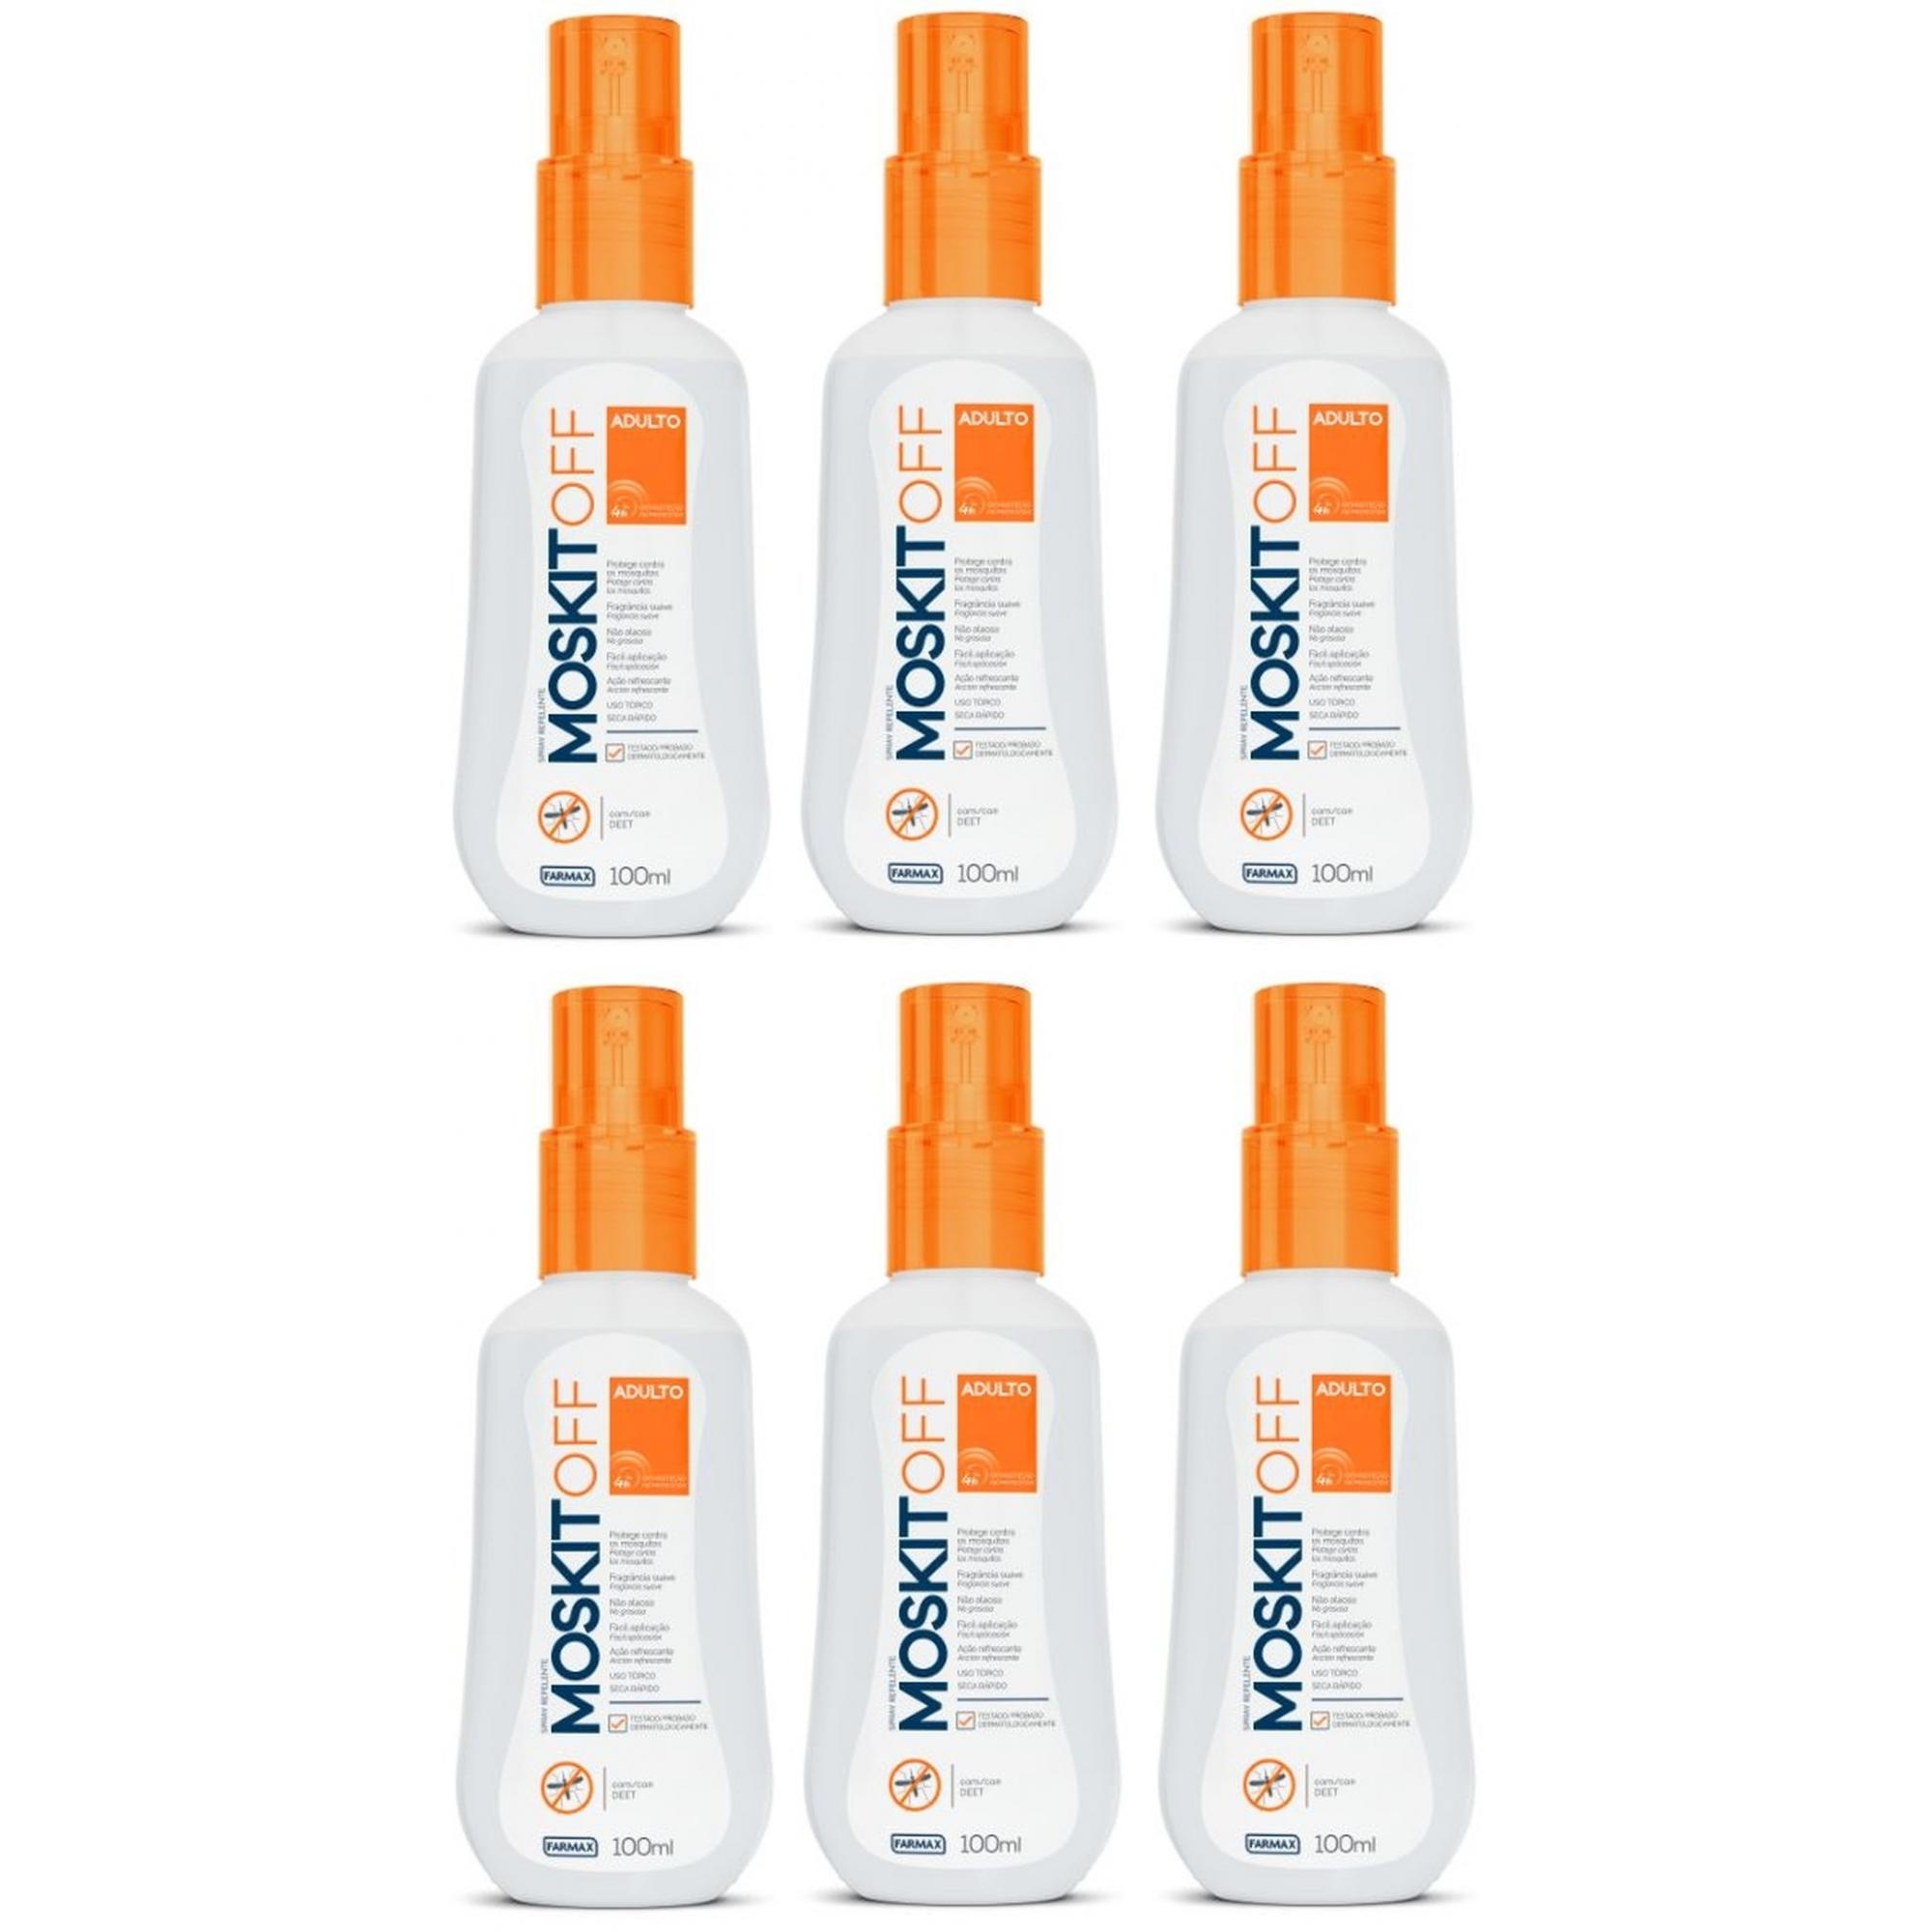 Repelente Moskitoff Oil Free DEET 100ml Spray 6 unidades